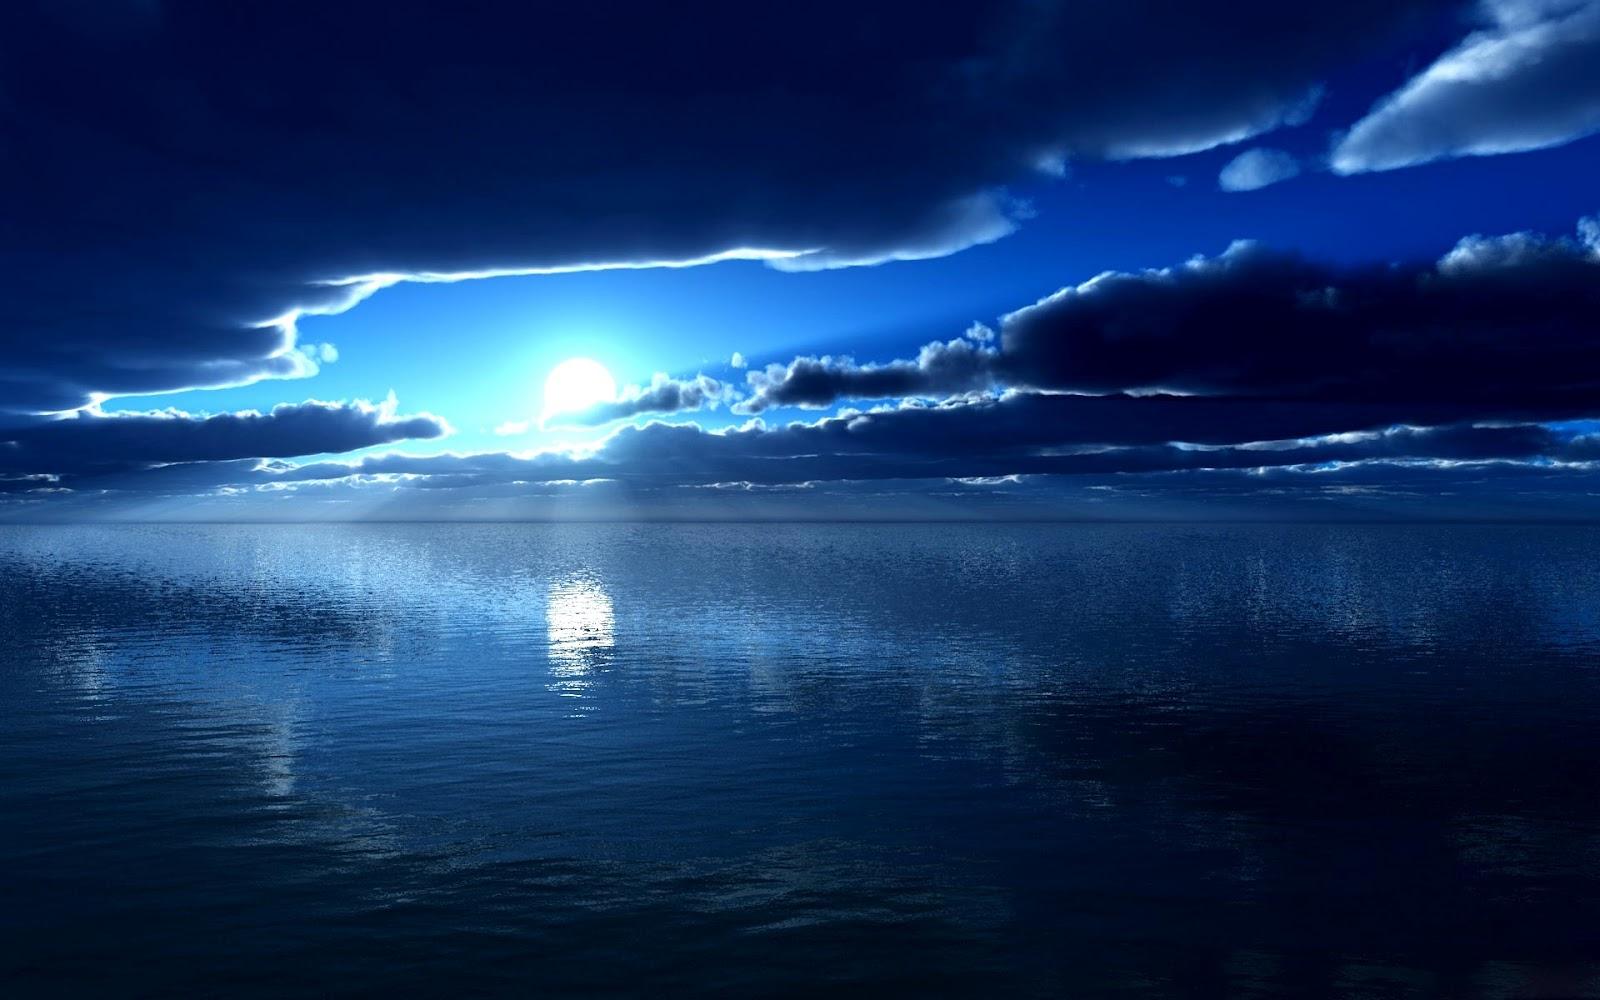 Beautiful Night Sky wallpaperWallpaper Background Wallpaper Background 1600x1000